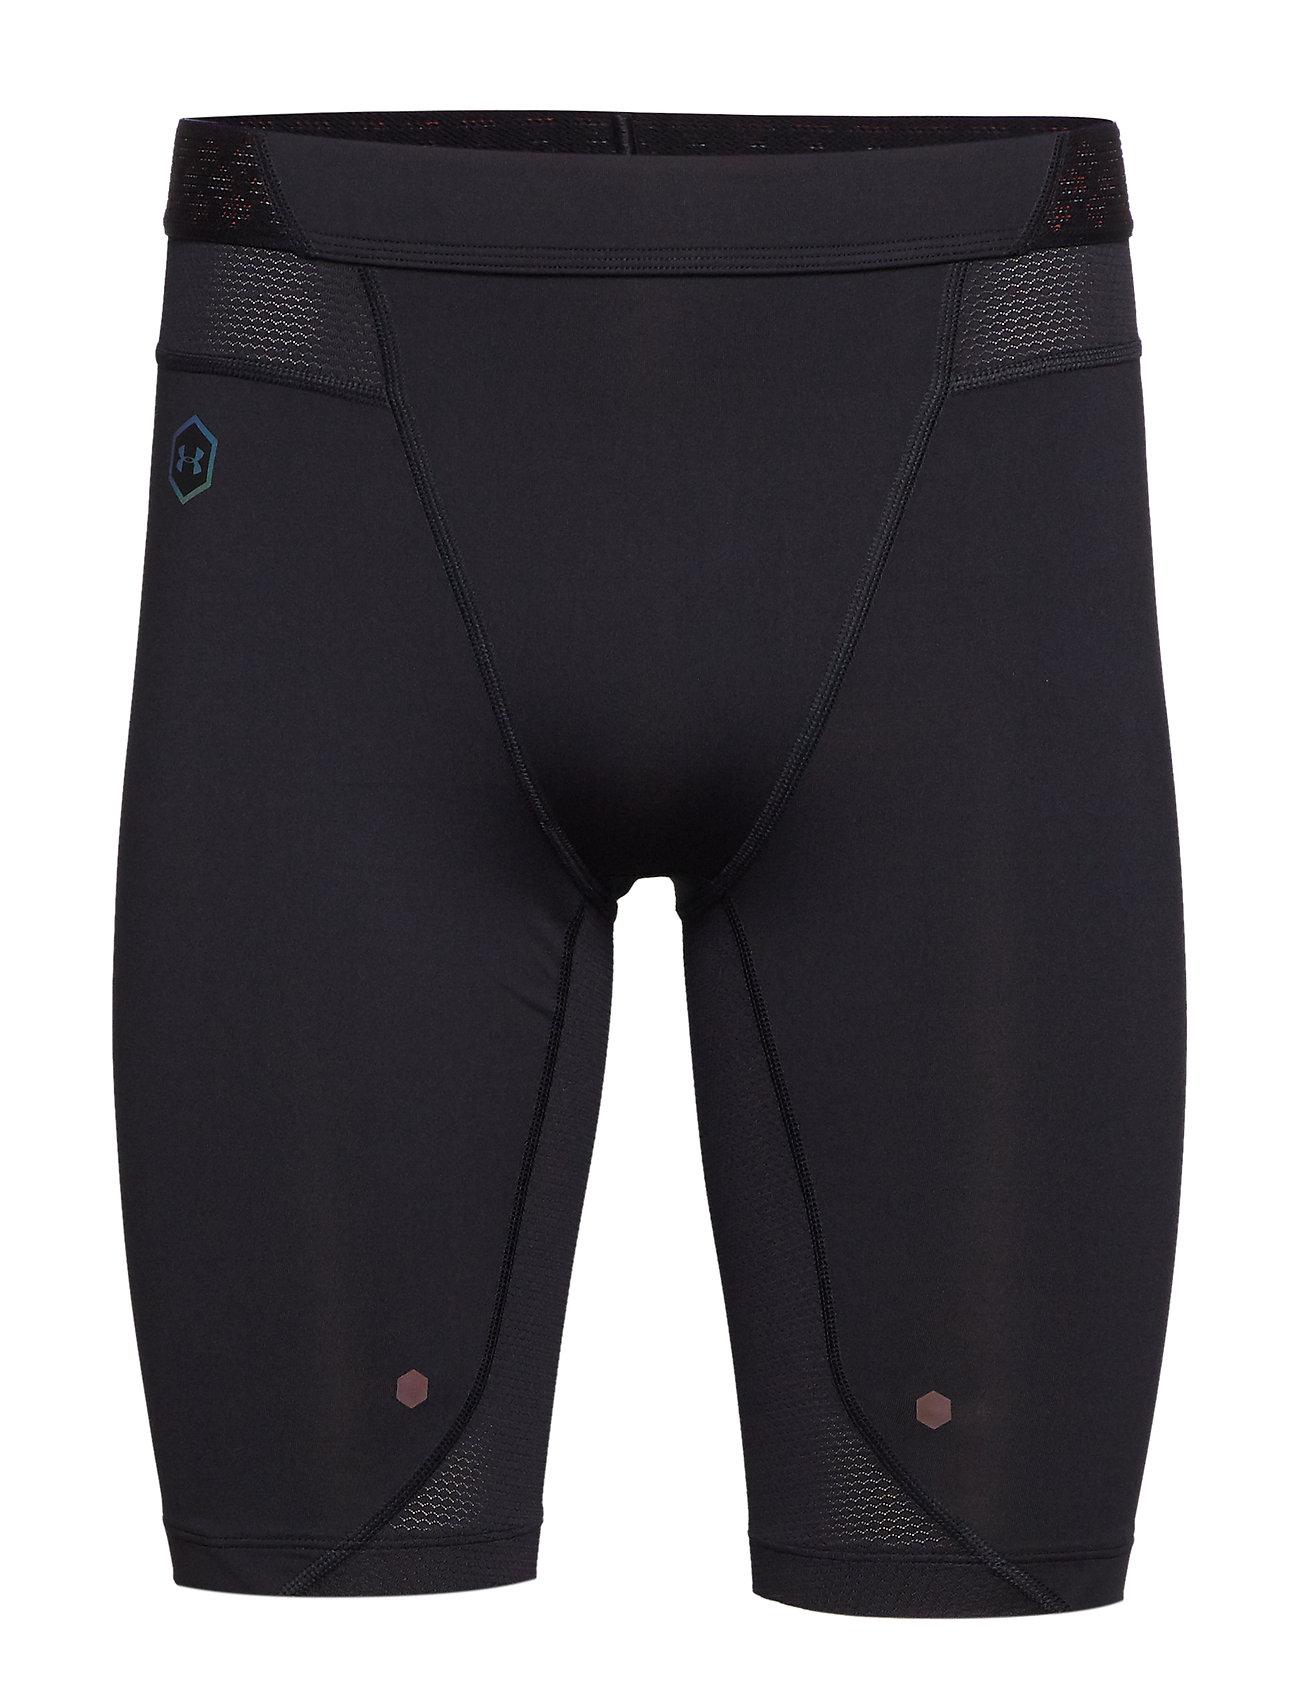 Under Armour UA Rush HG Comp Shorts - BLACK